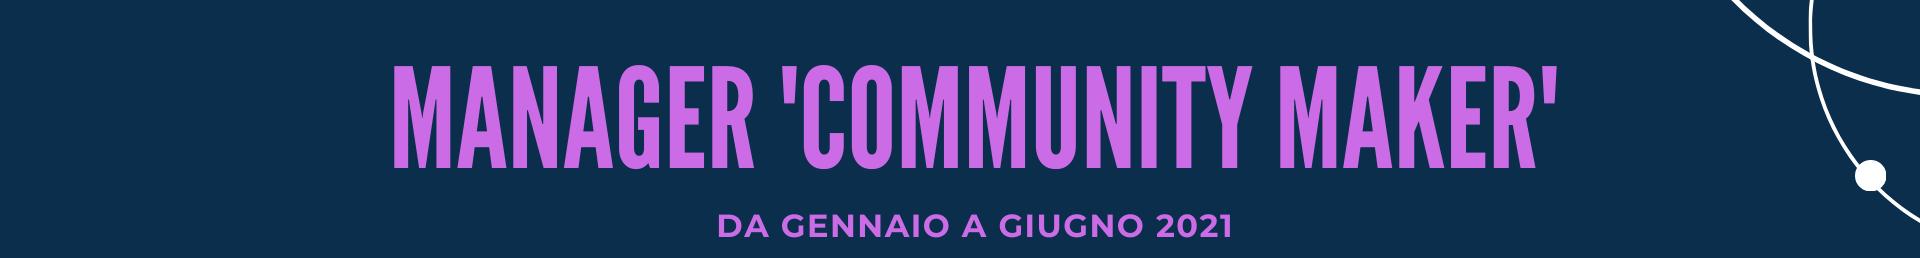 Manager Community Maker